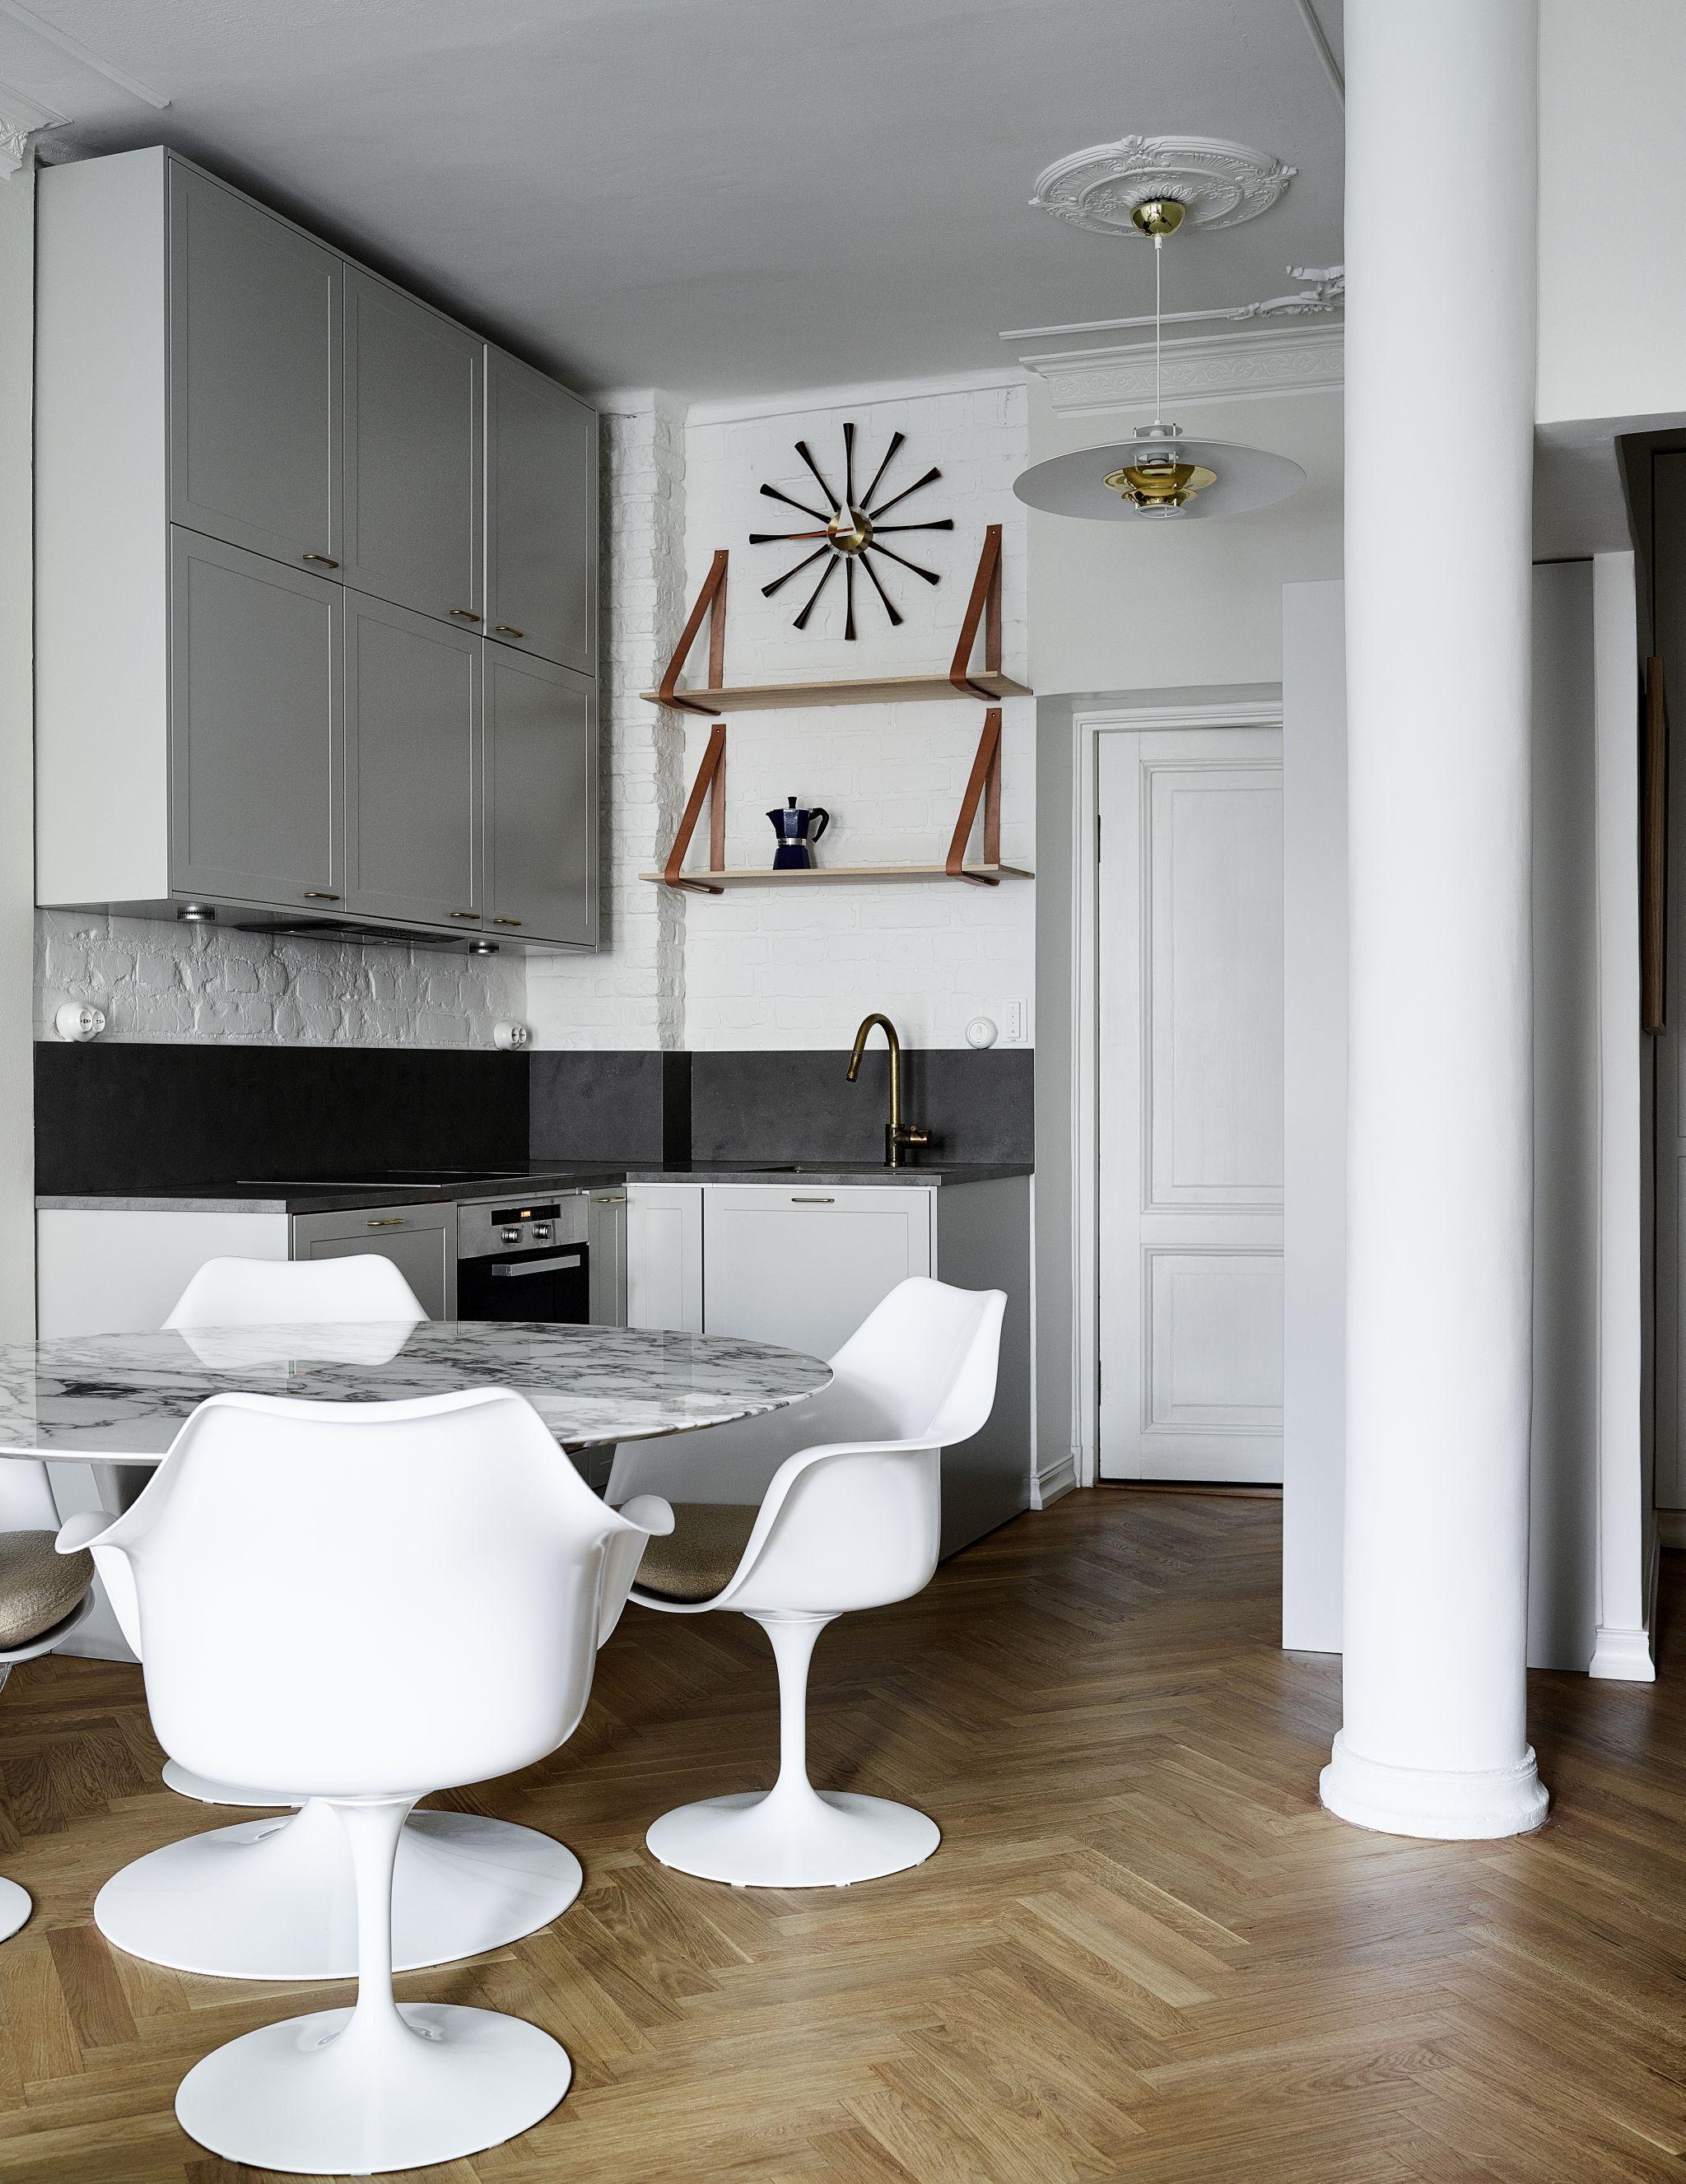 keittio-anna-koponen-design-05.jpg